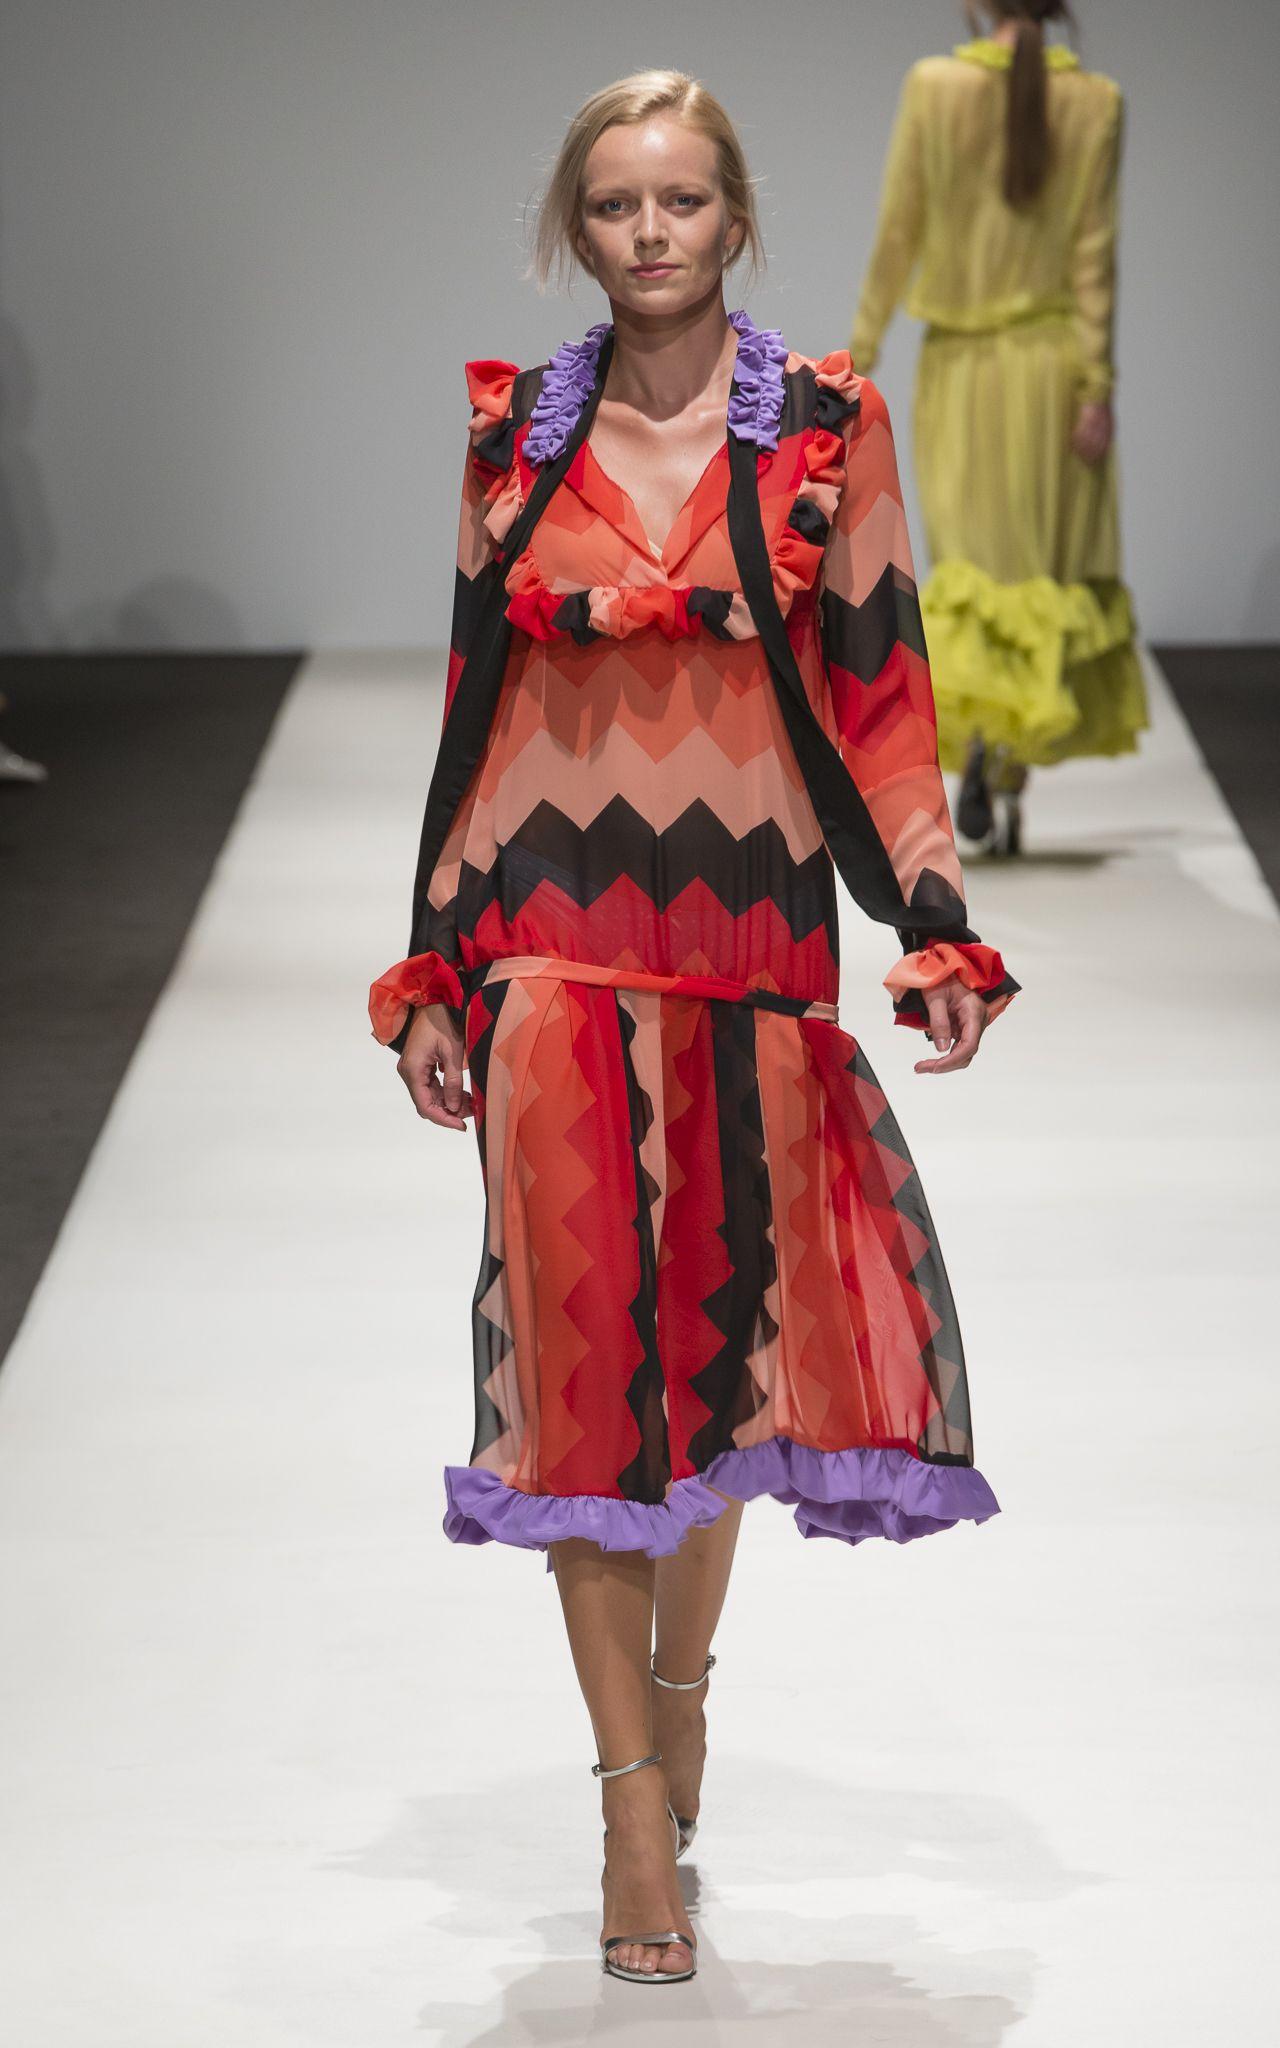 Smaranda Almasan at the MQ Vienna Fashion Week 2016